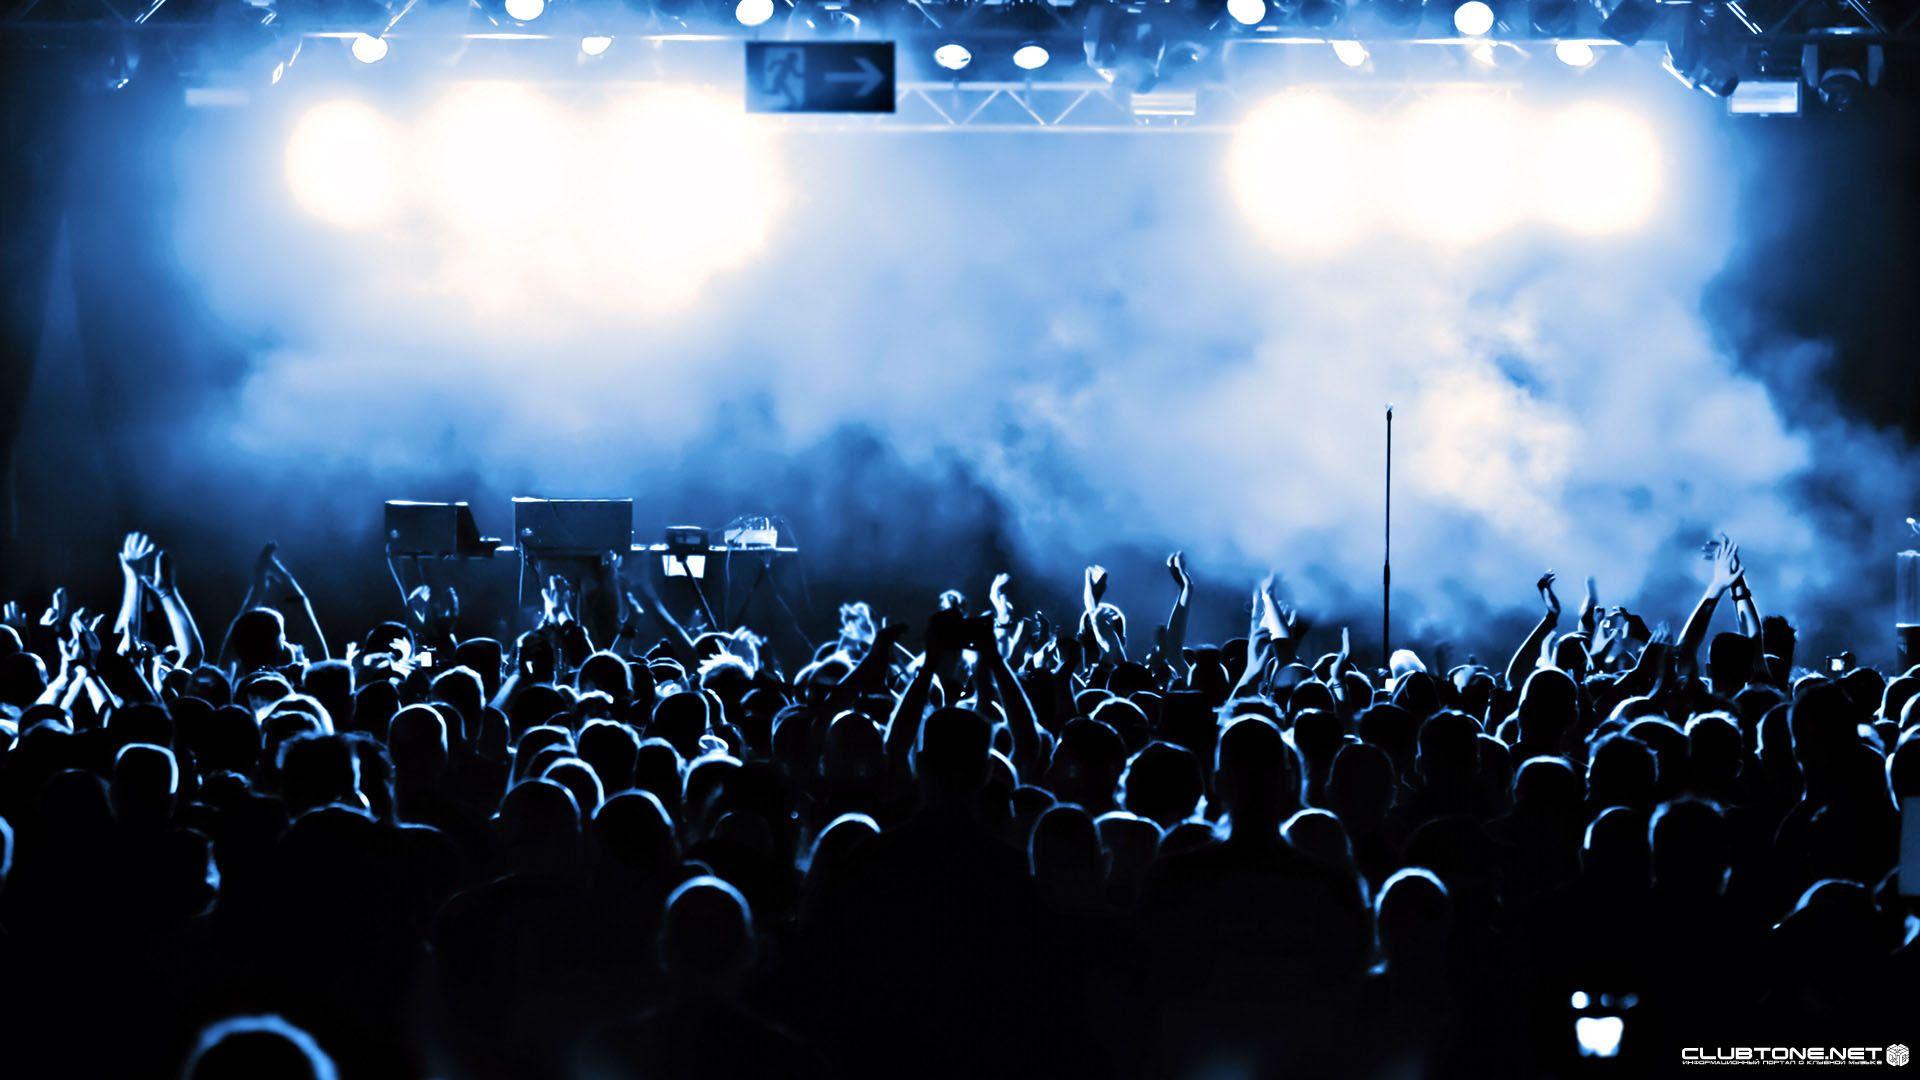 Concert 1080p Wallpaper